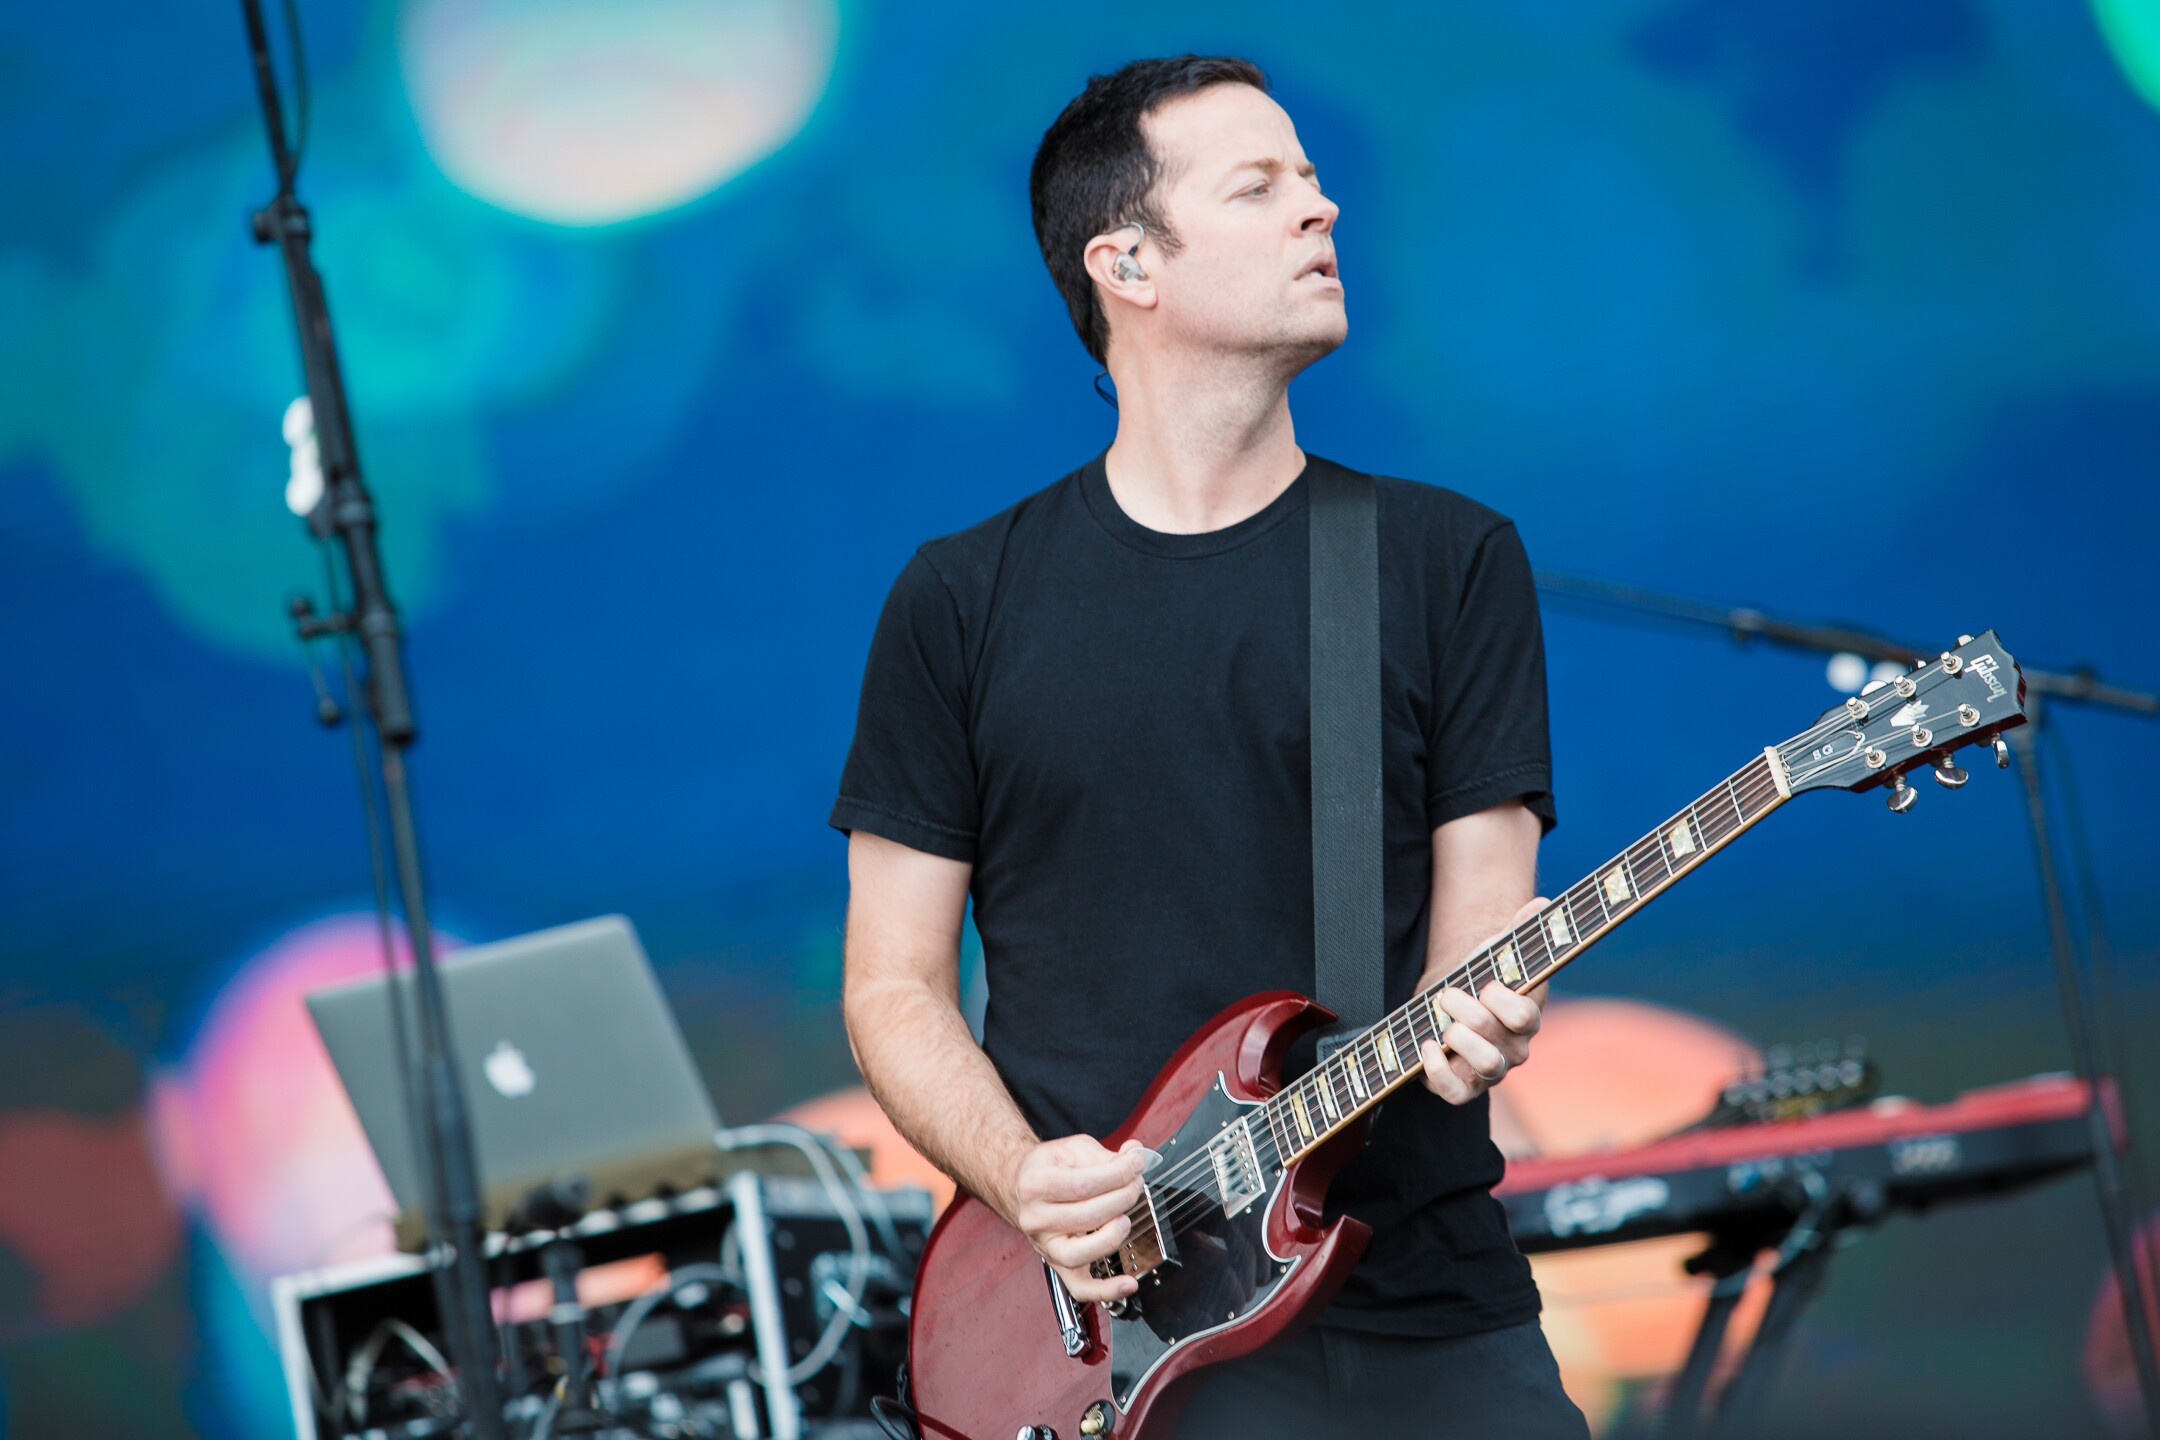 Jimmy Eat World will perform June 29 at Summerfest